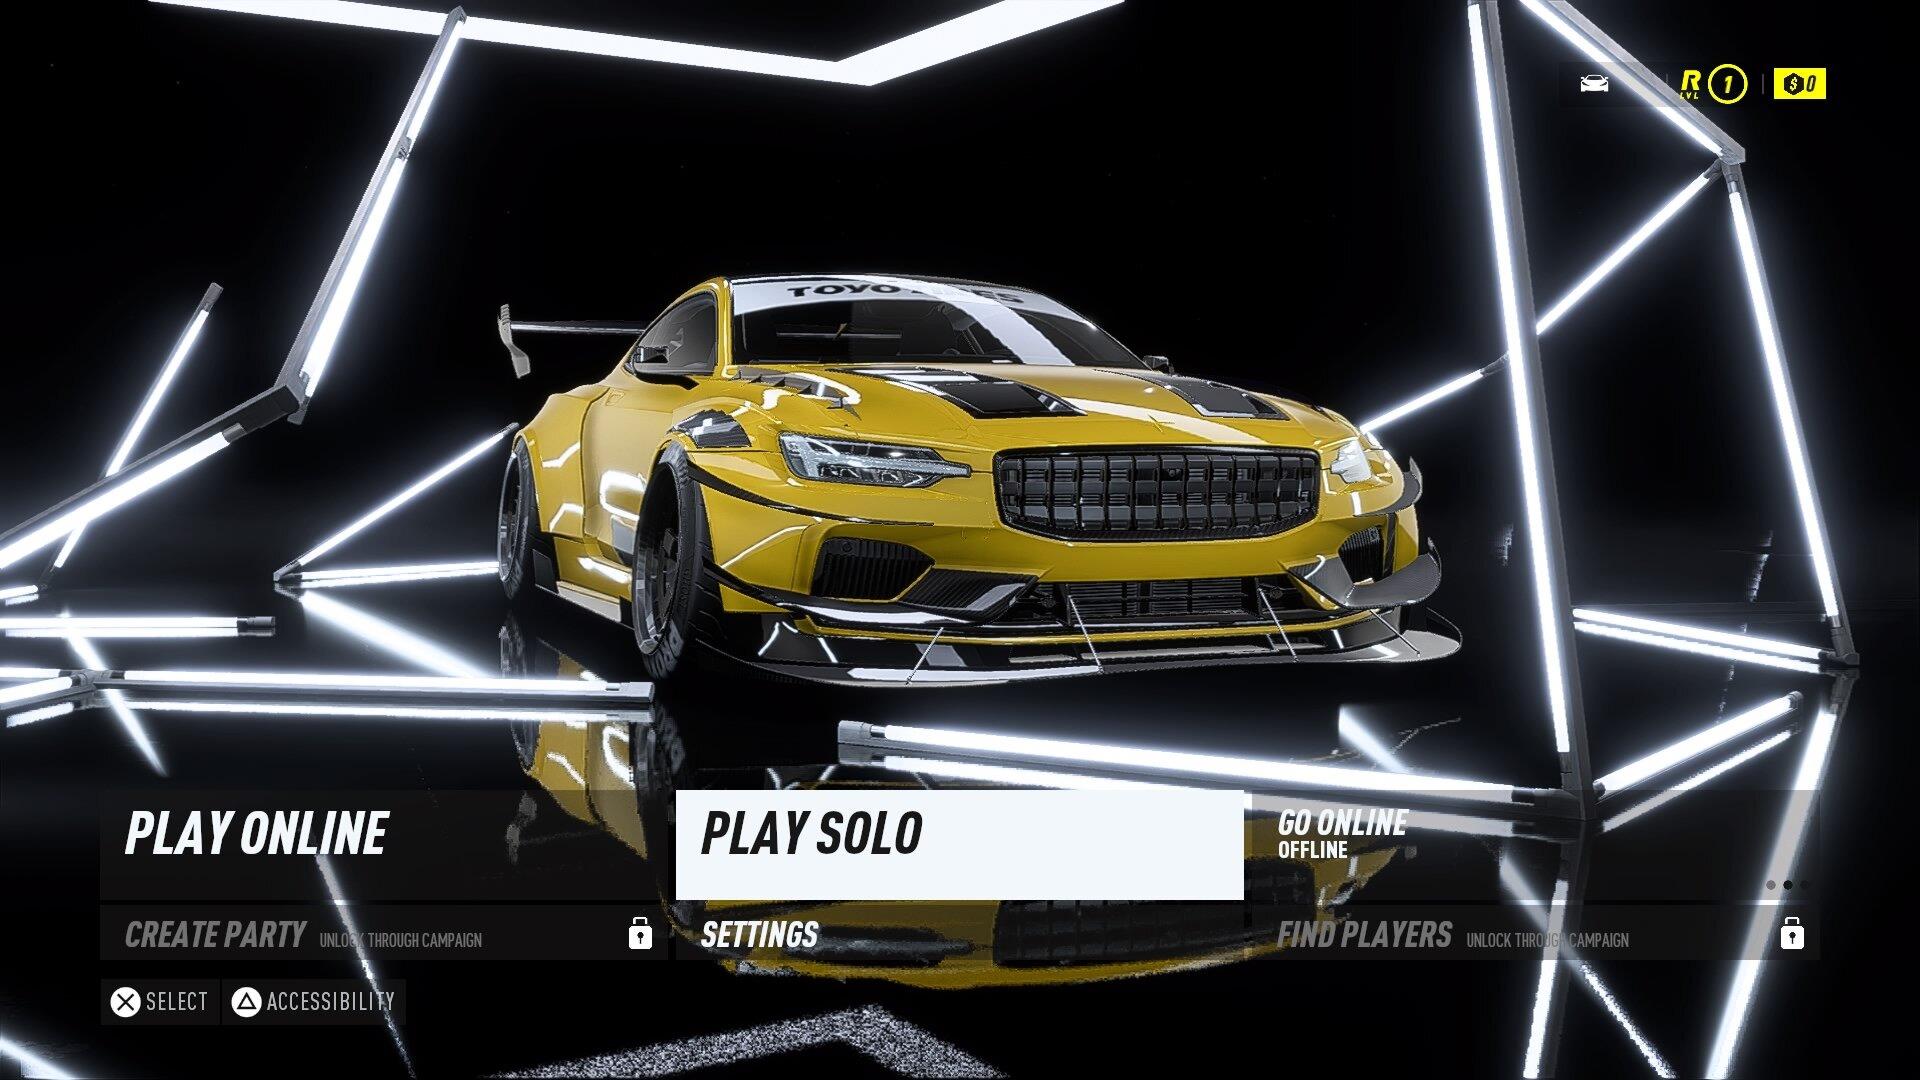 Playstation 4 In-Game Screenshoot